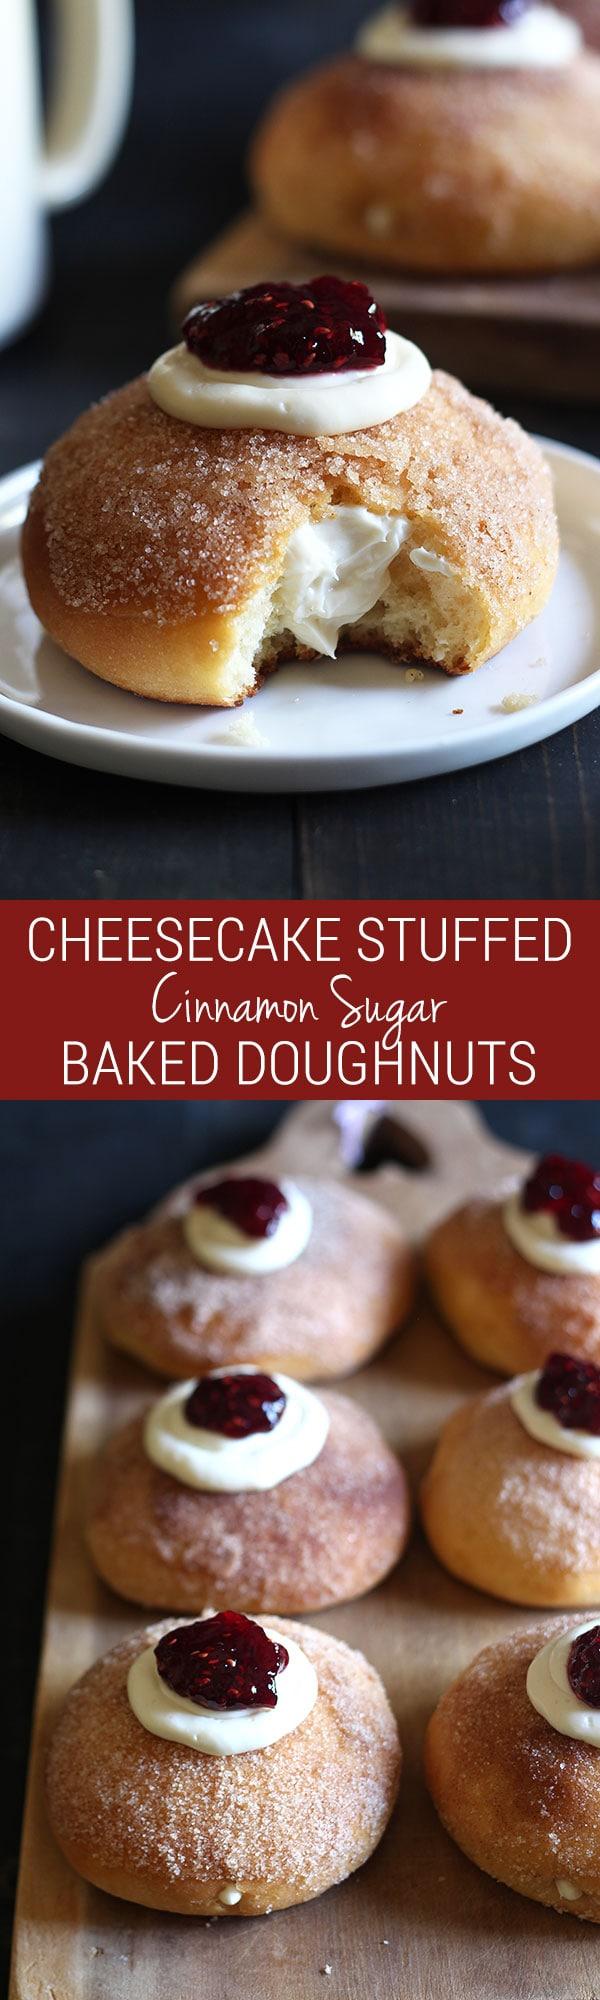 ... doughnut coated in cinnamon sugar, stuffed with sweetened cream cheese